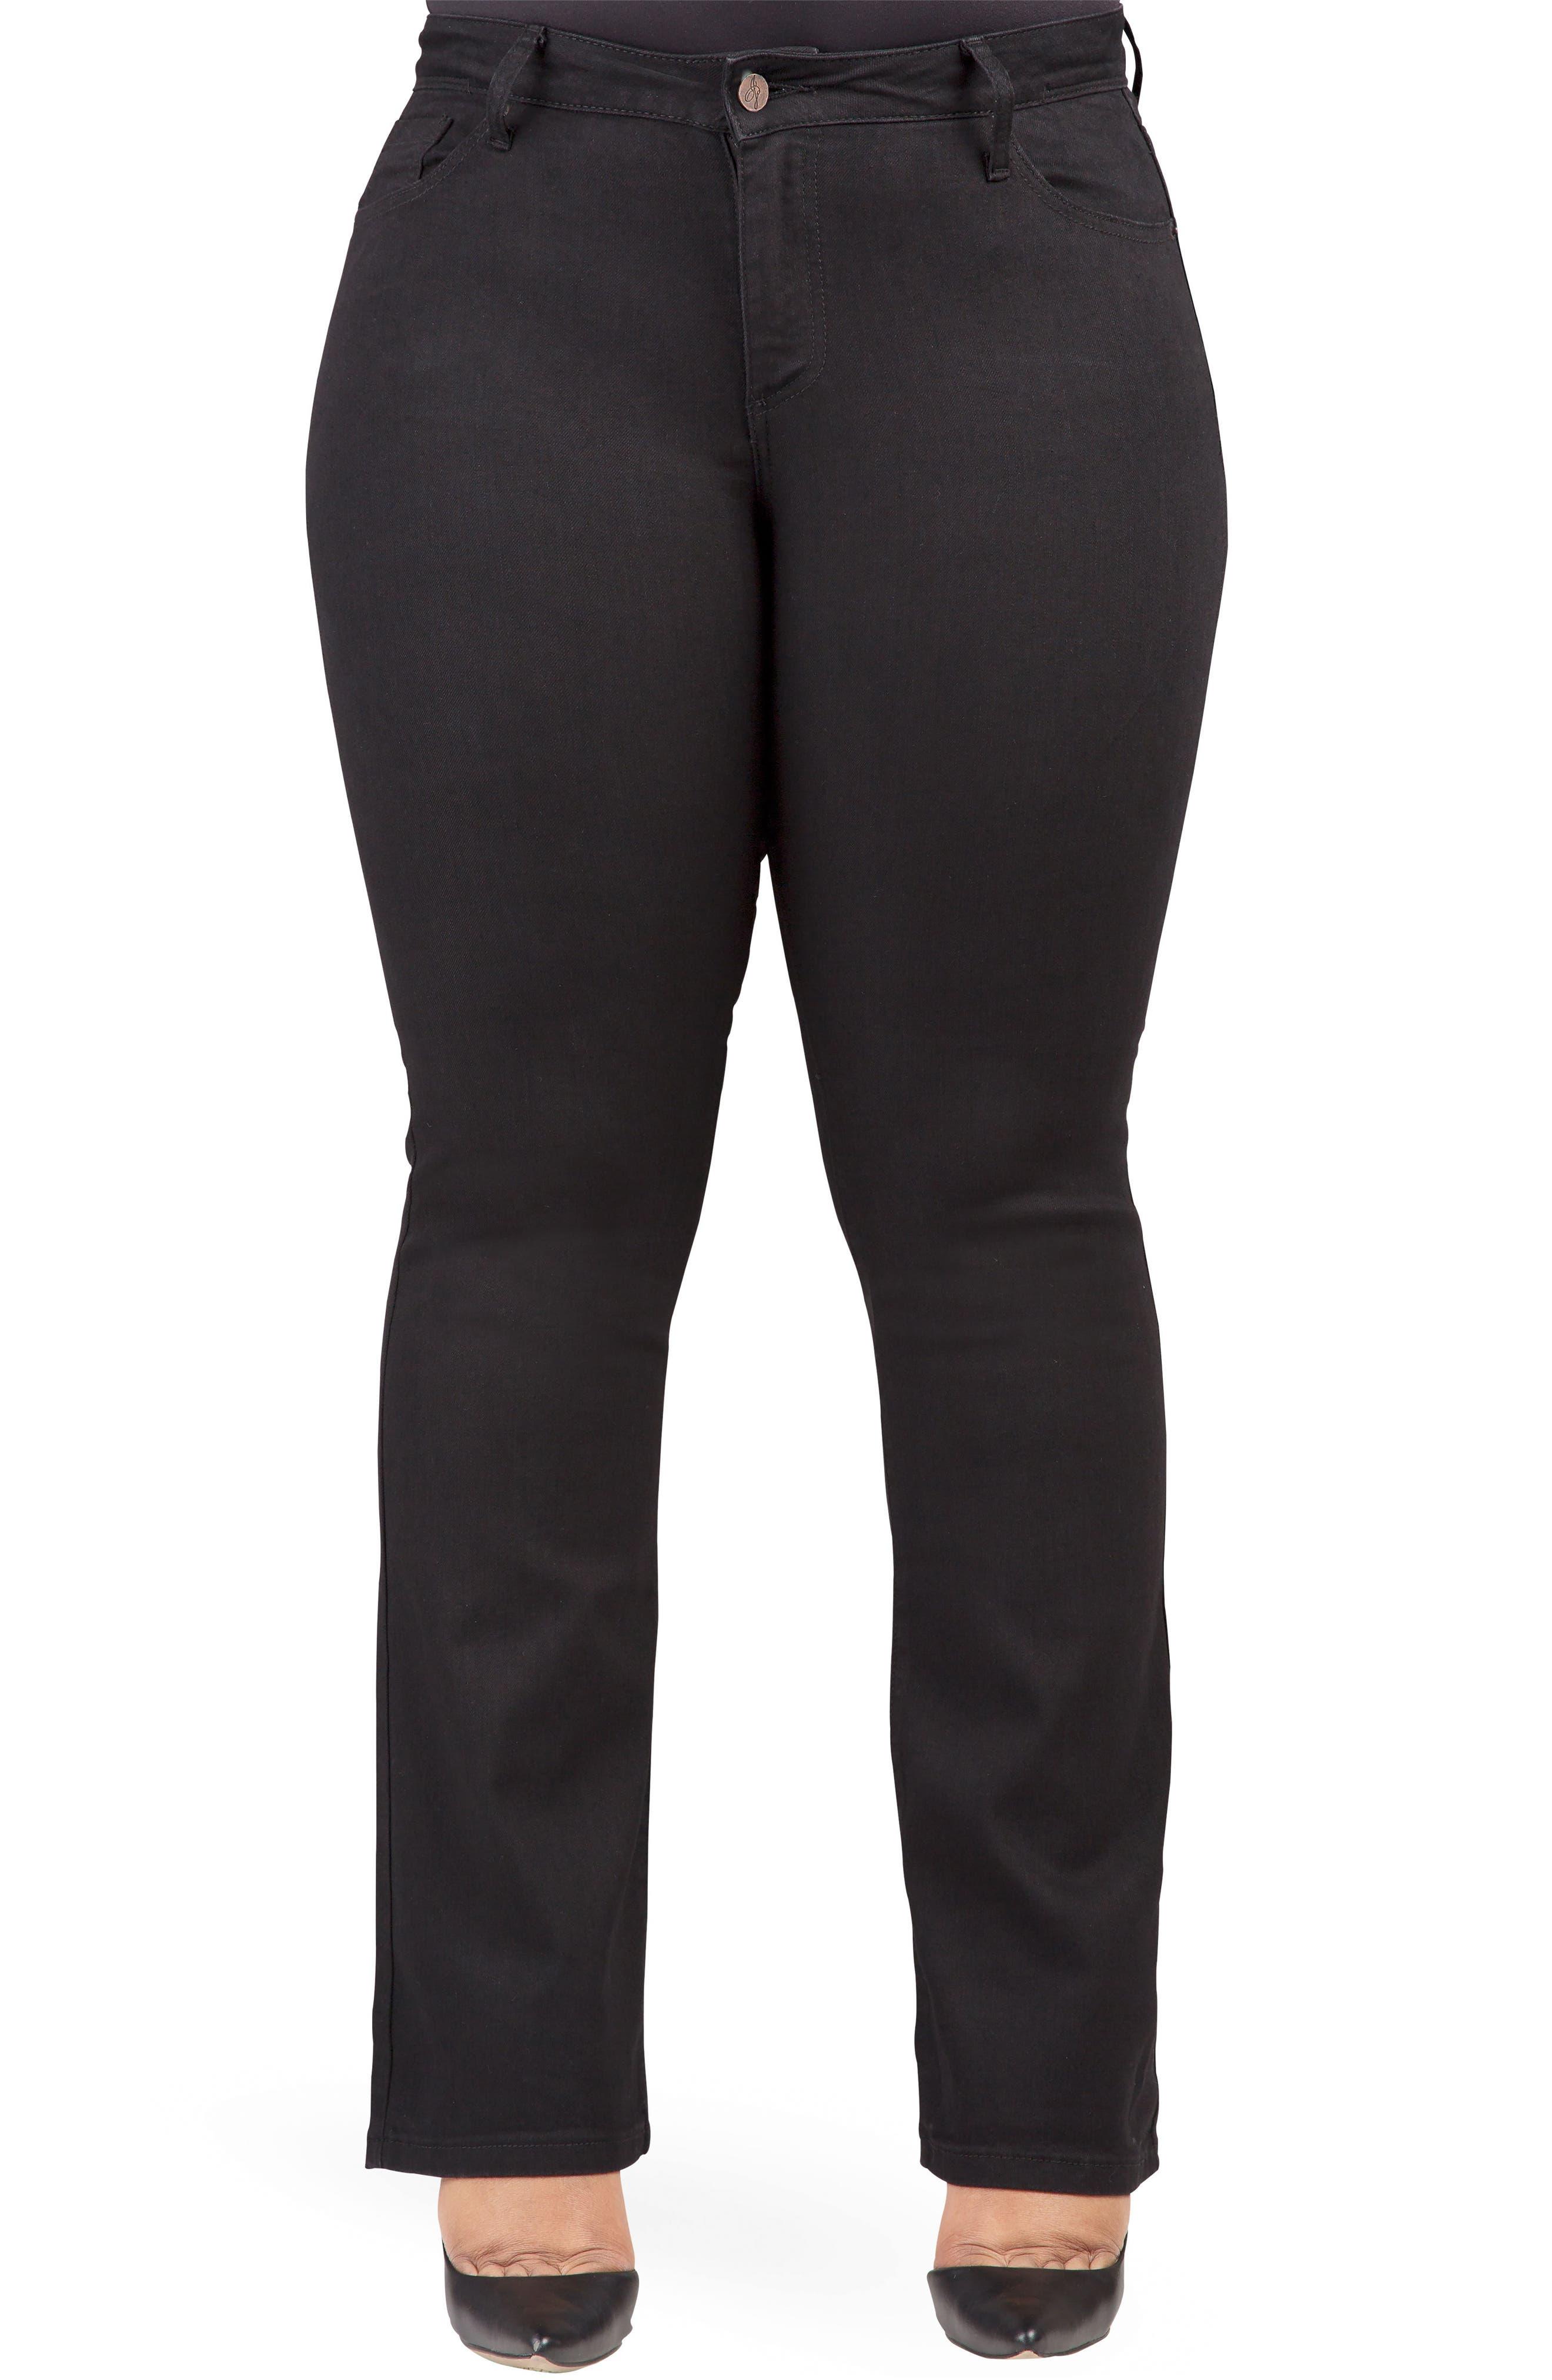 POETIC JUSTICE Scarlett Slim Bootcut Curvy Fit Jeans